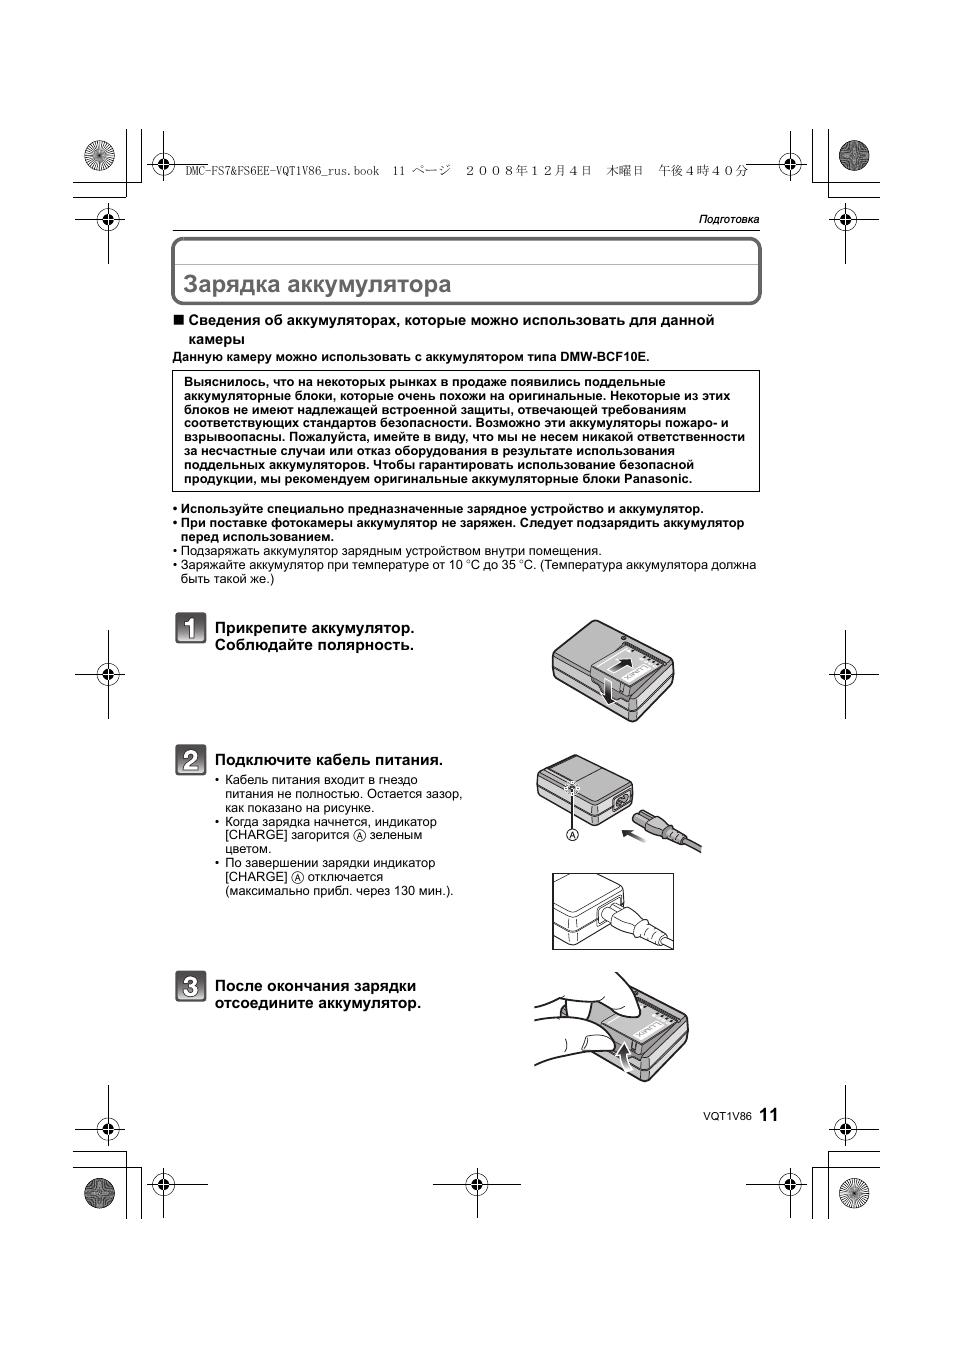 Подготовка, Зарядка аккумулятора, P11)